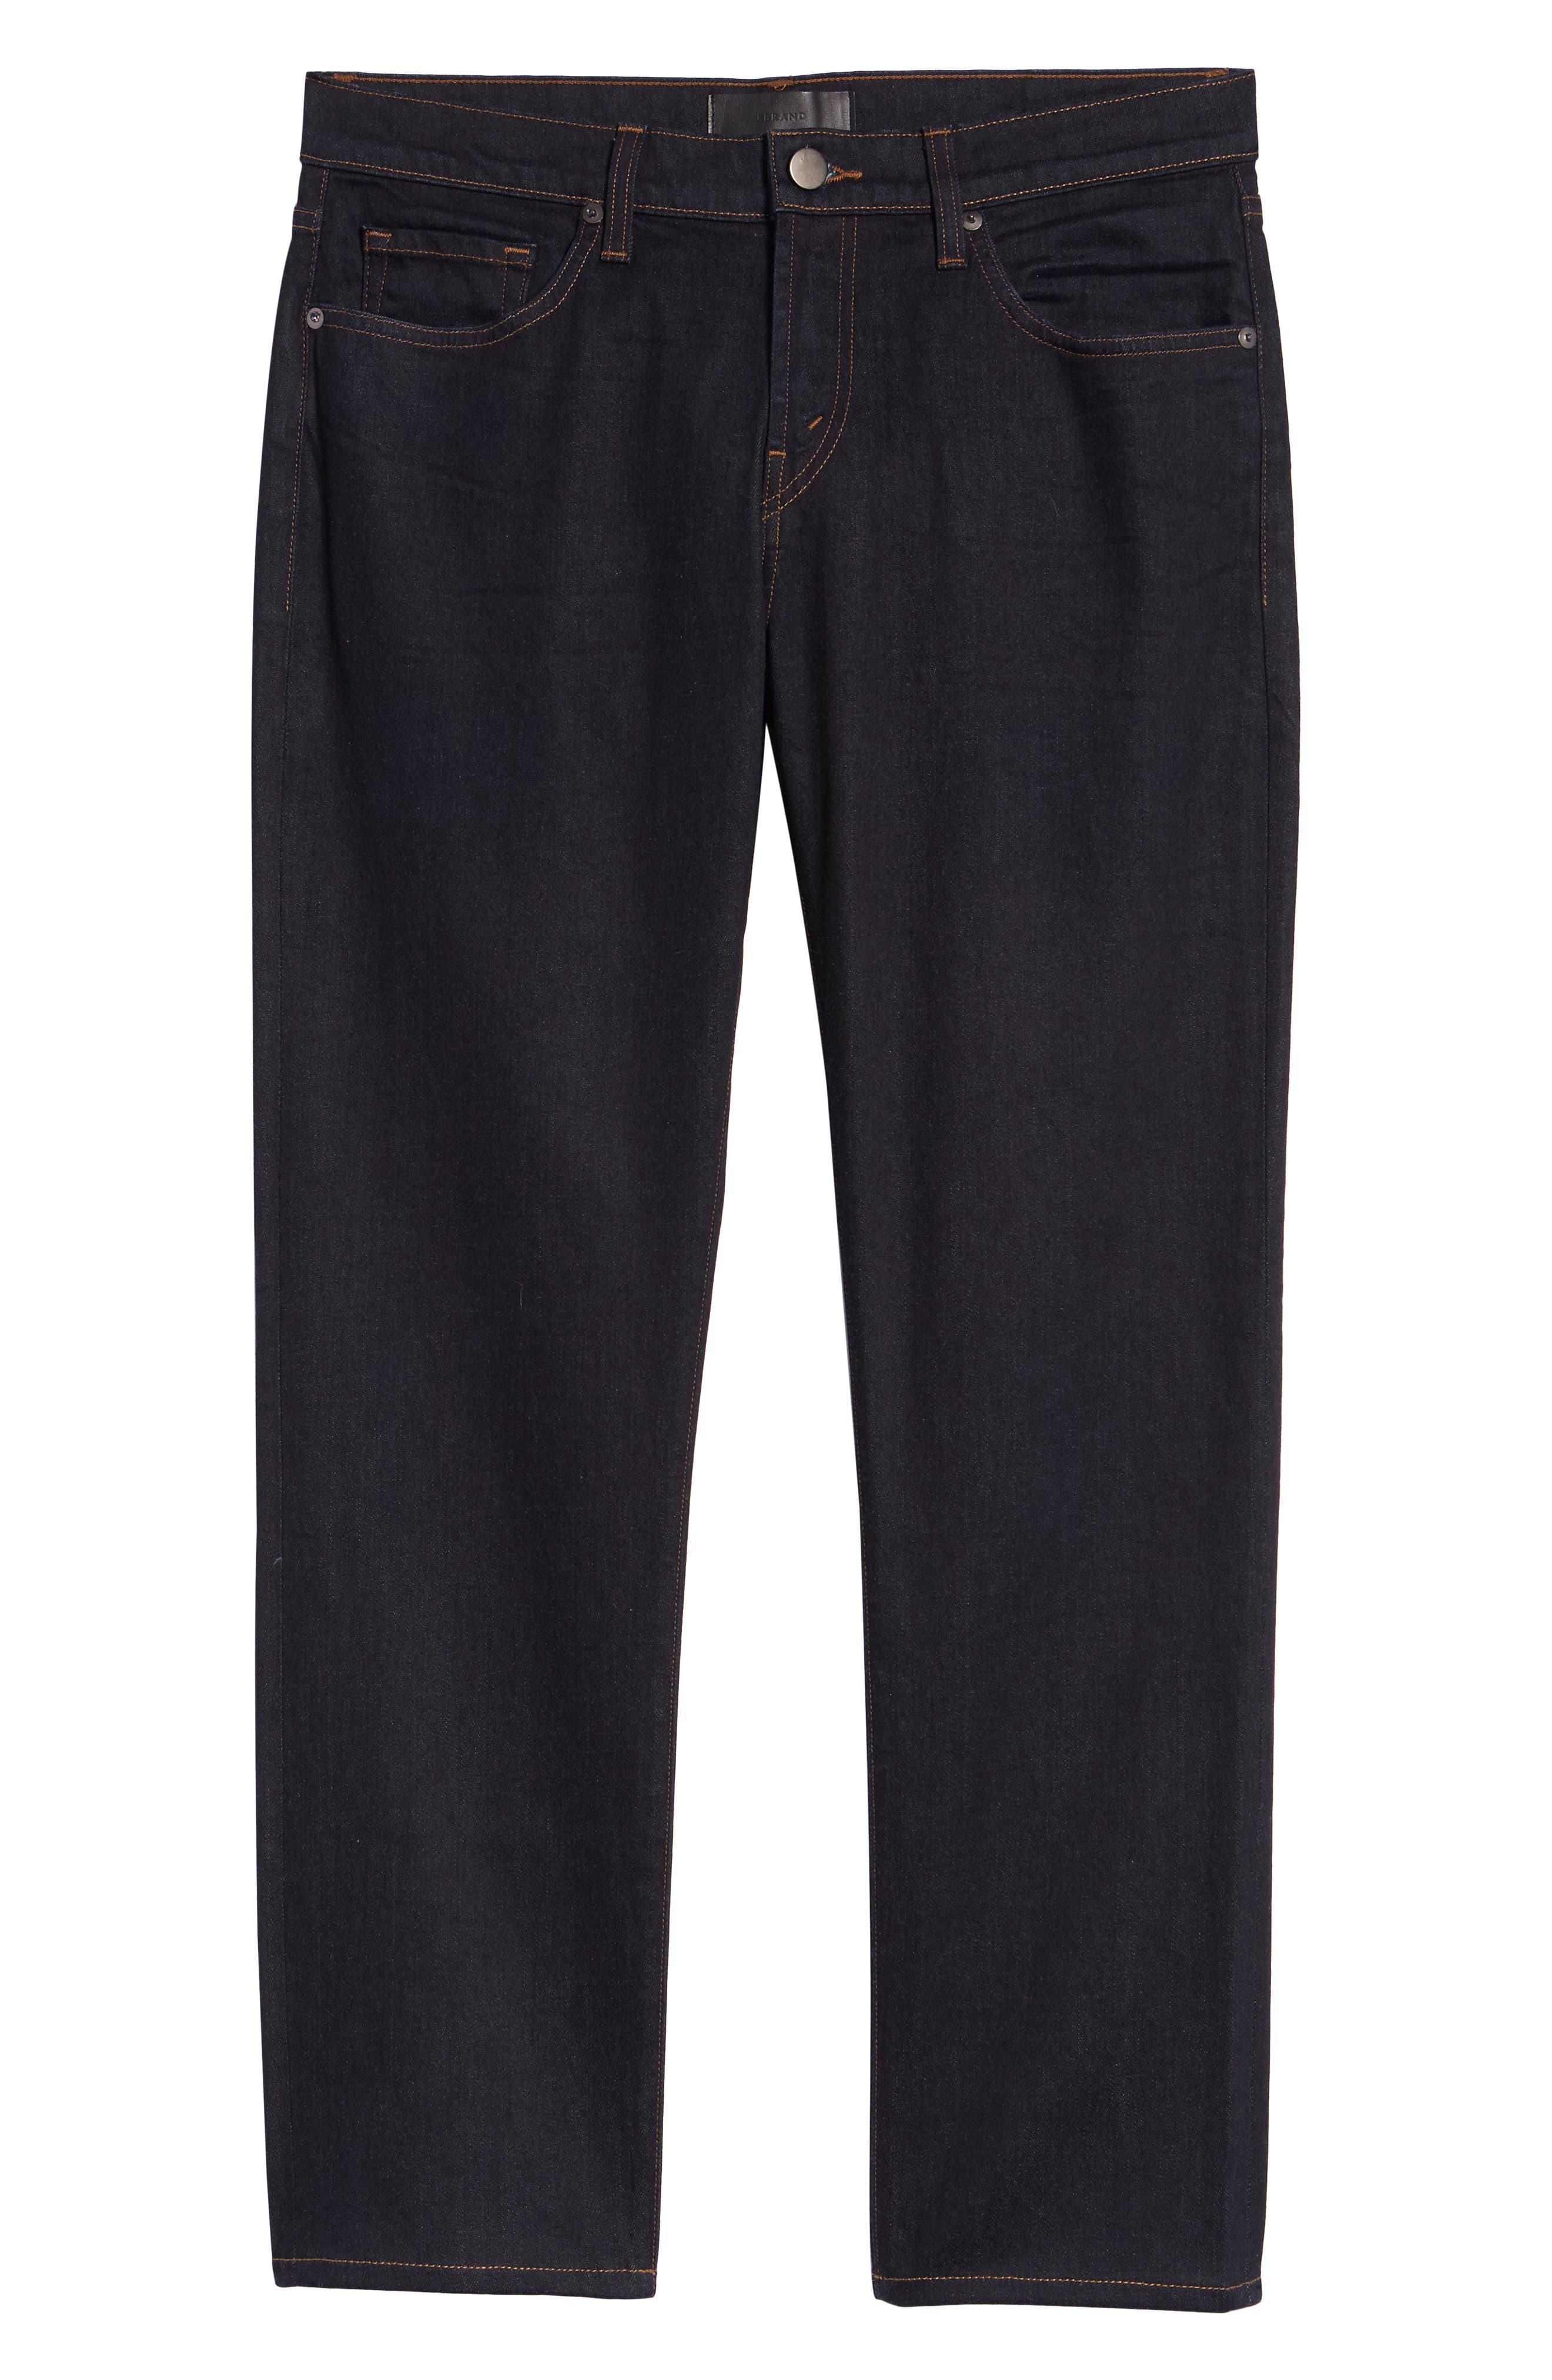 Tyler Slim Fit Jeans,                             Alternate thumbnail 2, color,                             WILSON BLUE